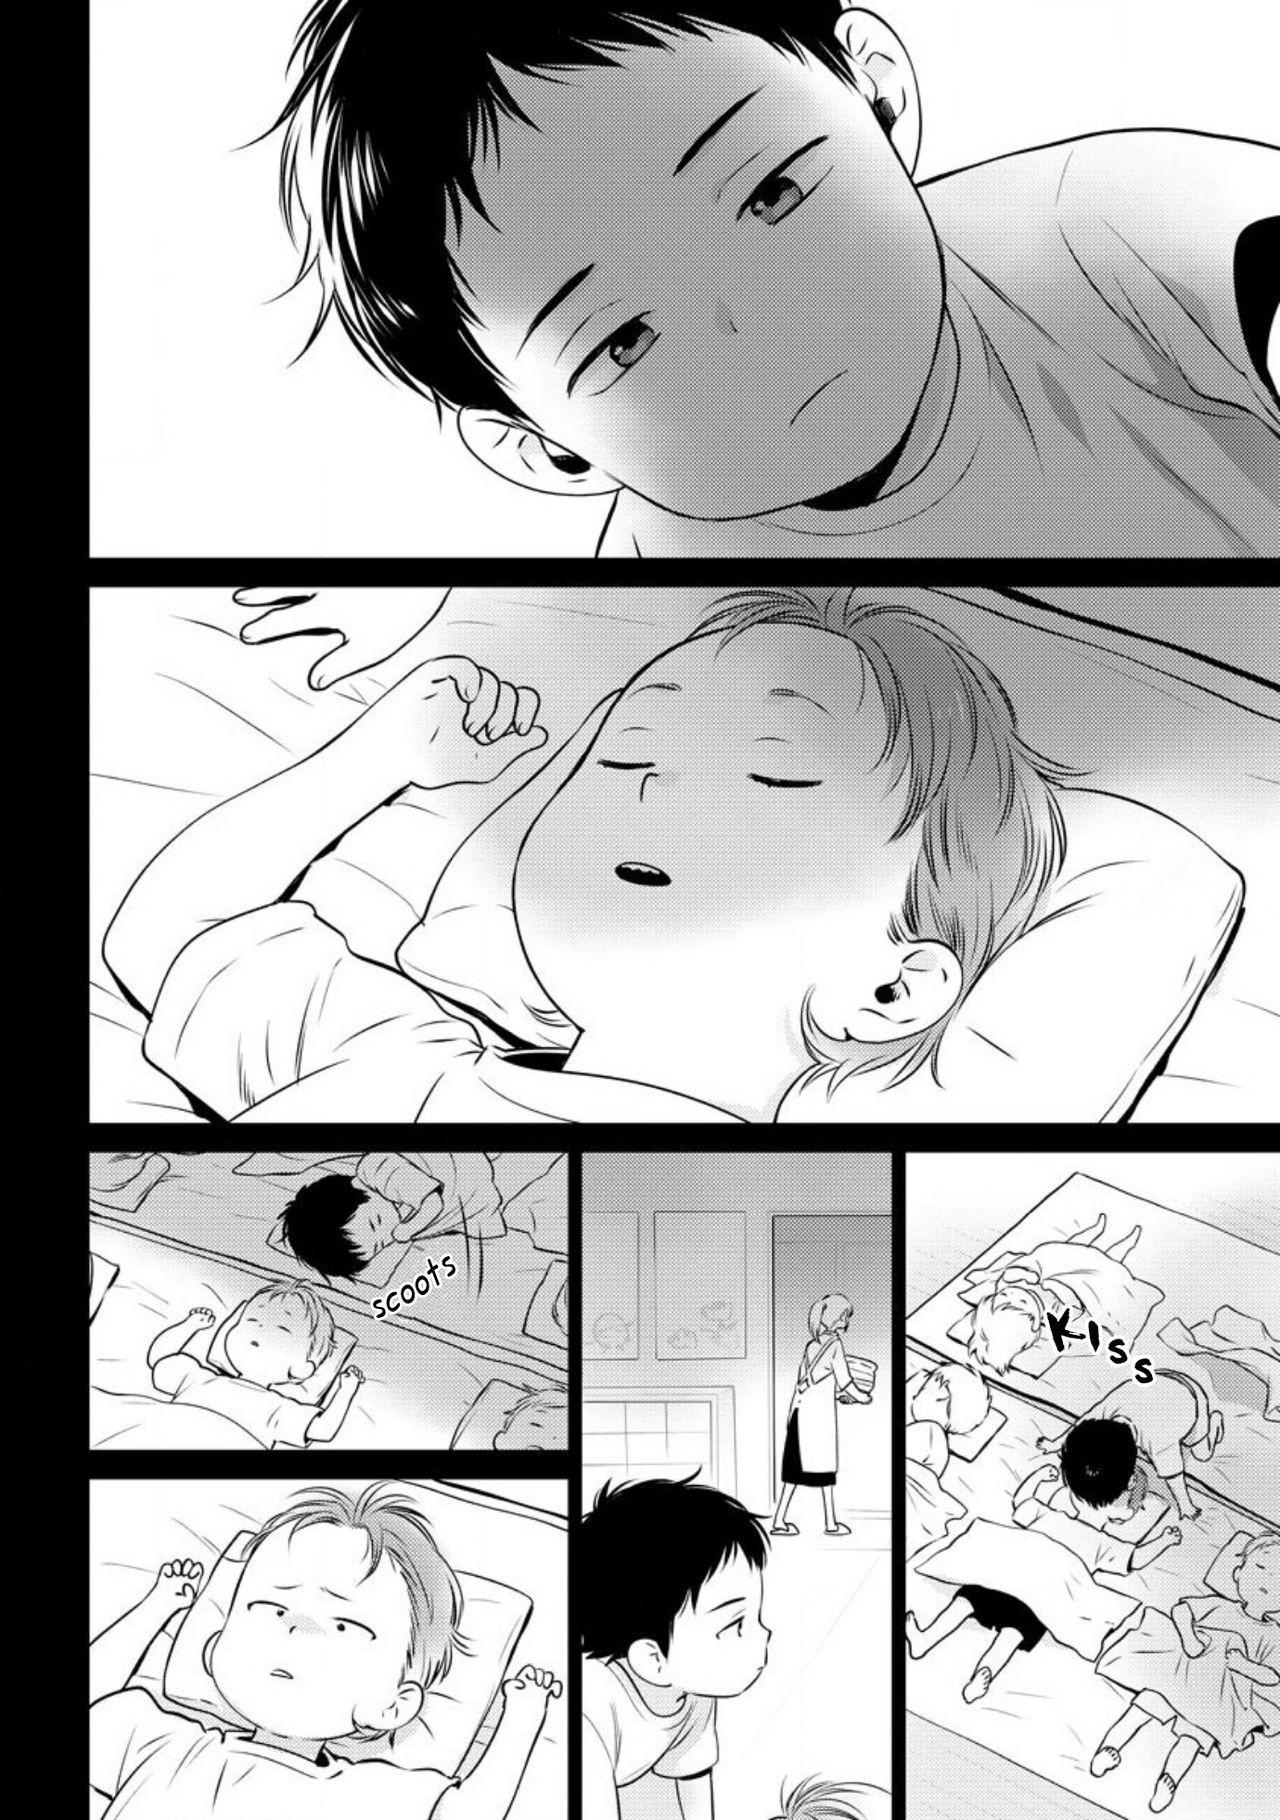 [Hiiragi Nozomu] Nakasete Yaru yo Yankee-kun   I'll Make You Cry Ch. 1-5 + Extras [English] [Digital] 10